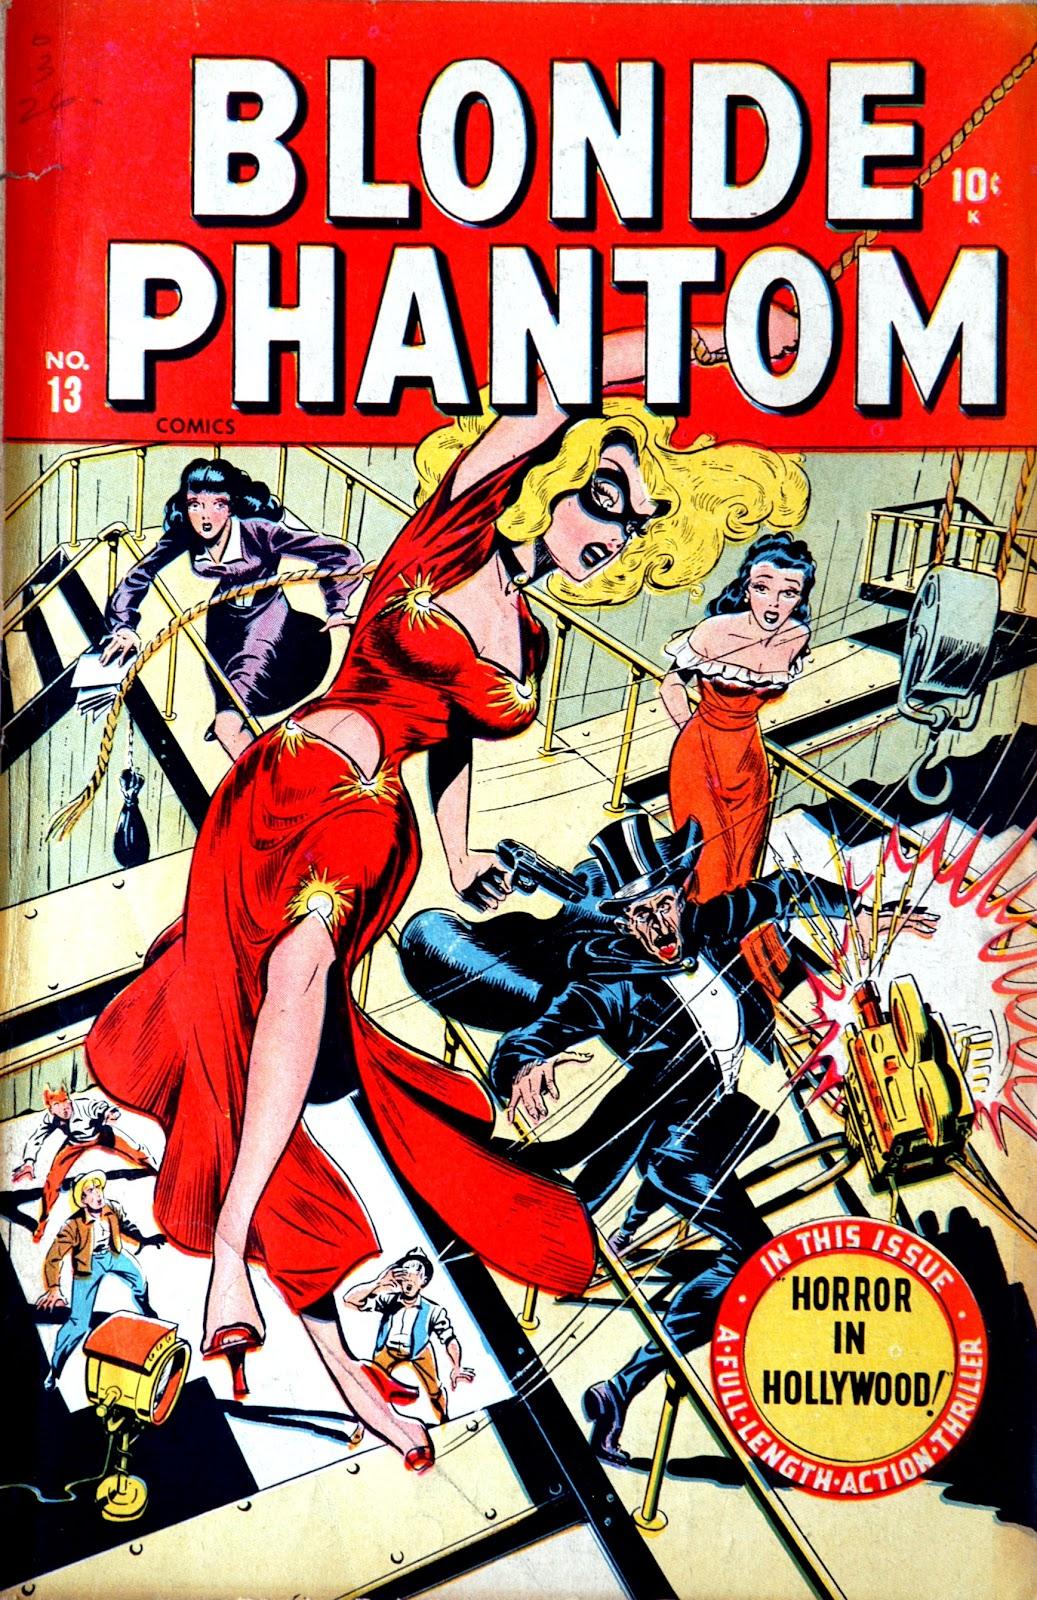 Blonde Phantom Comics 13 Page 1